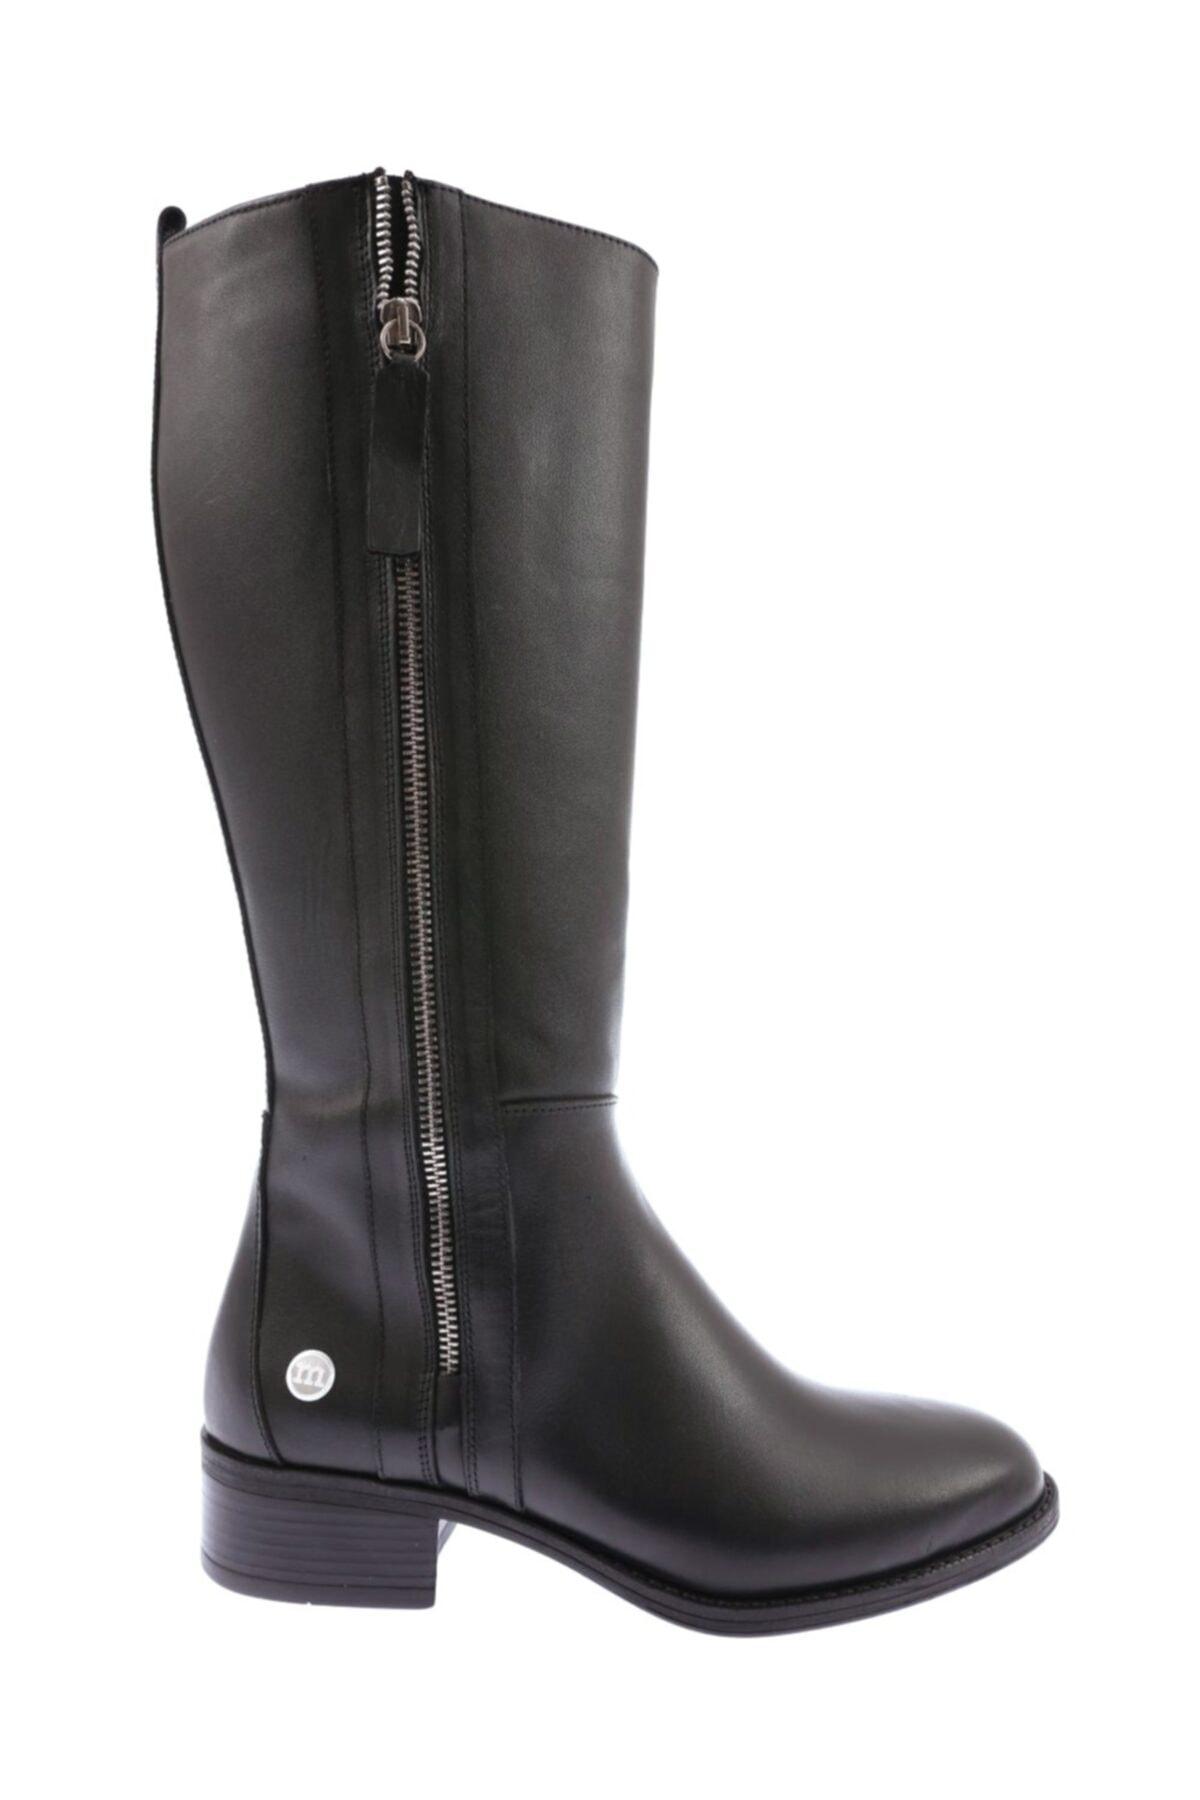 Mammamia D20kc-2000 Deri Kadın Çizme Siyah Faber 1